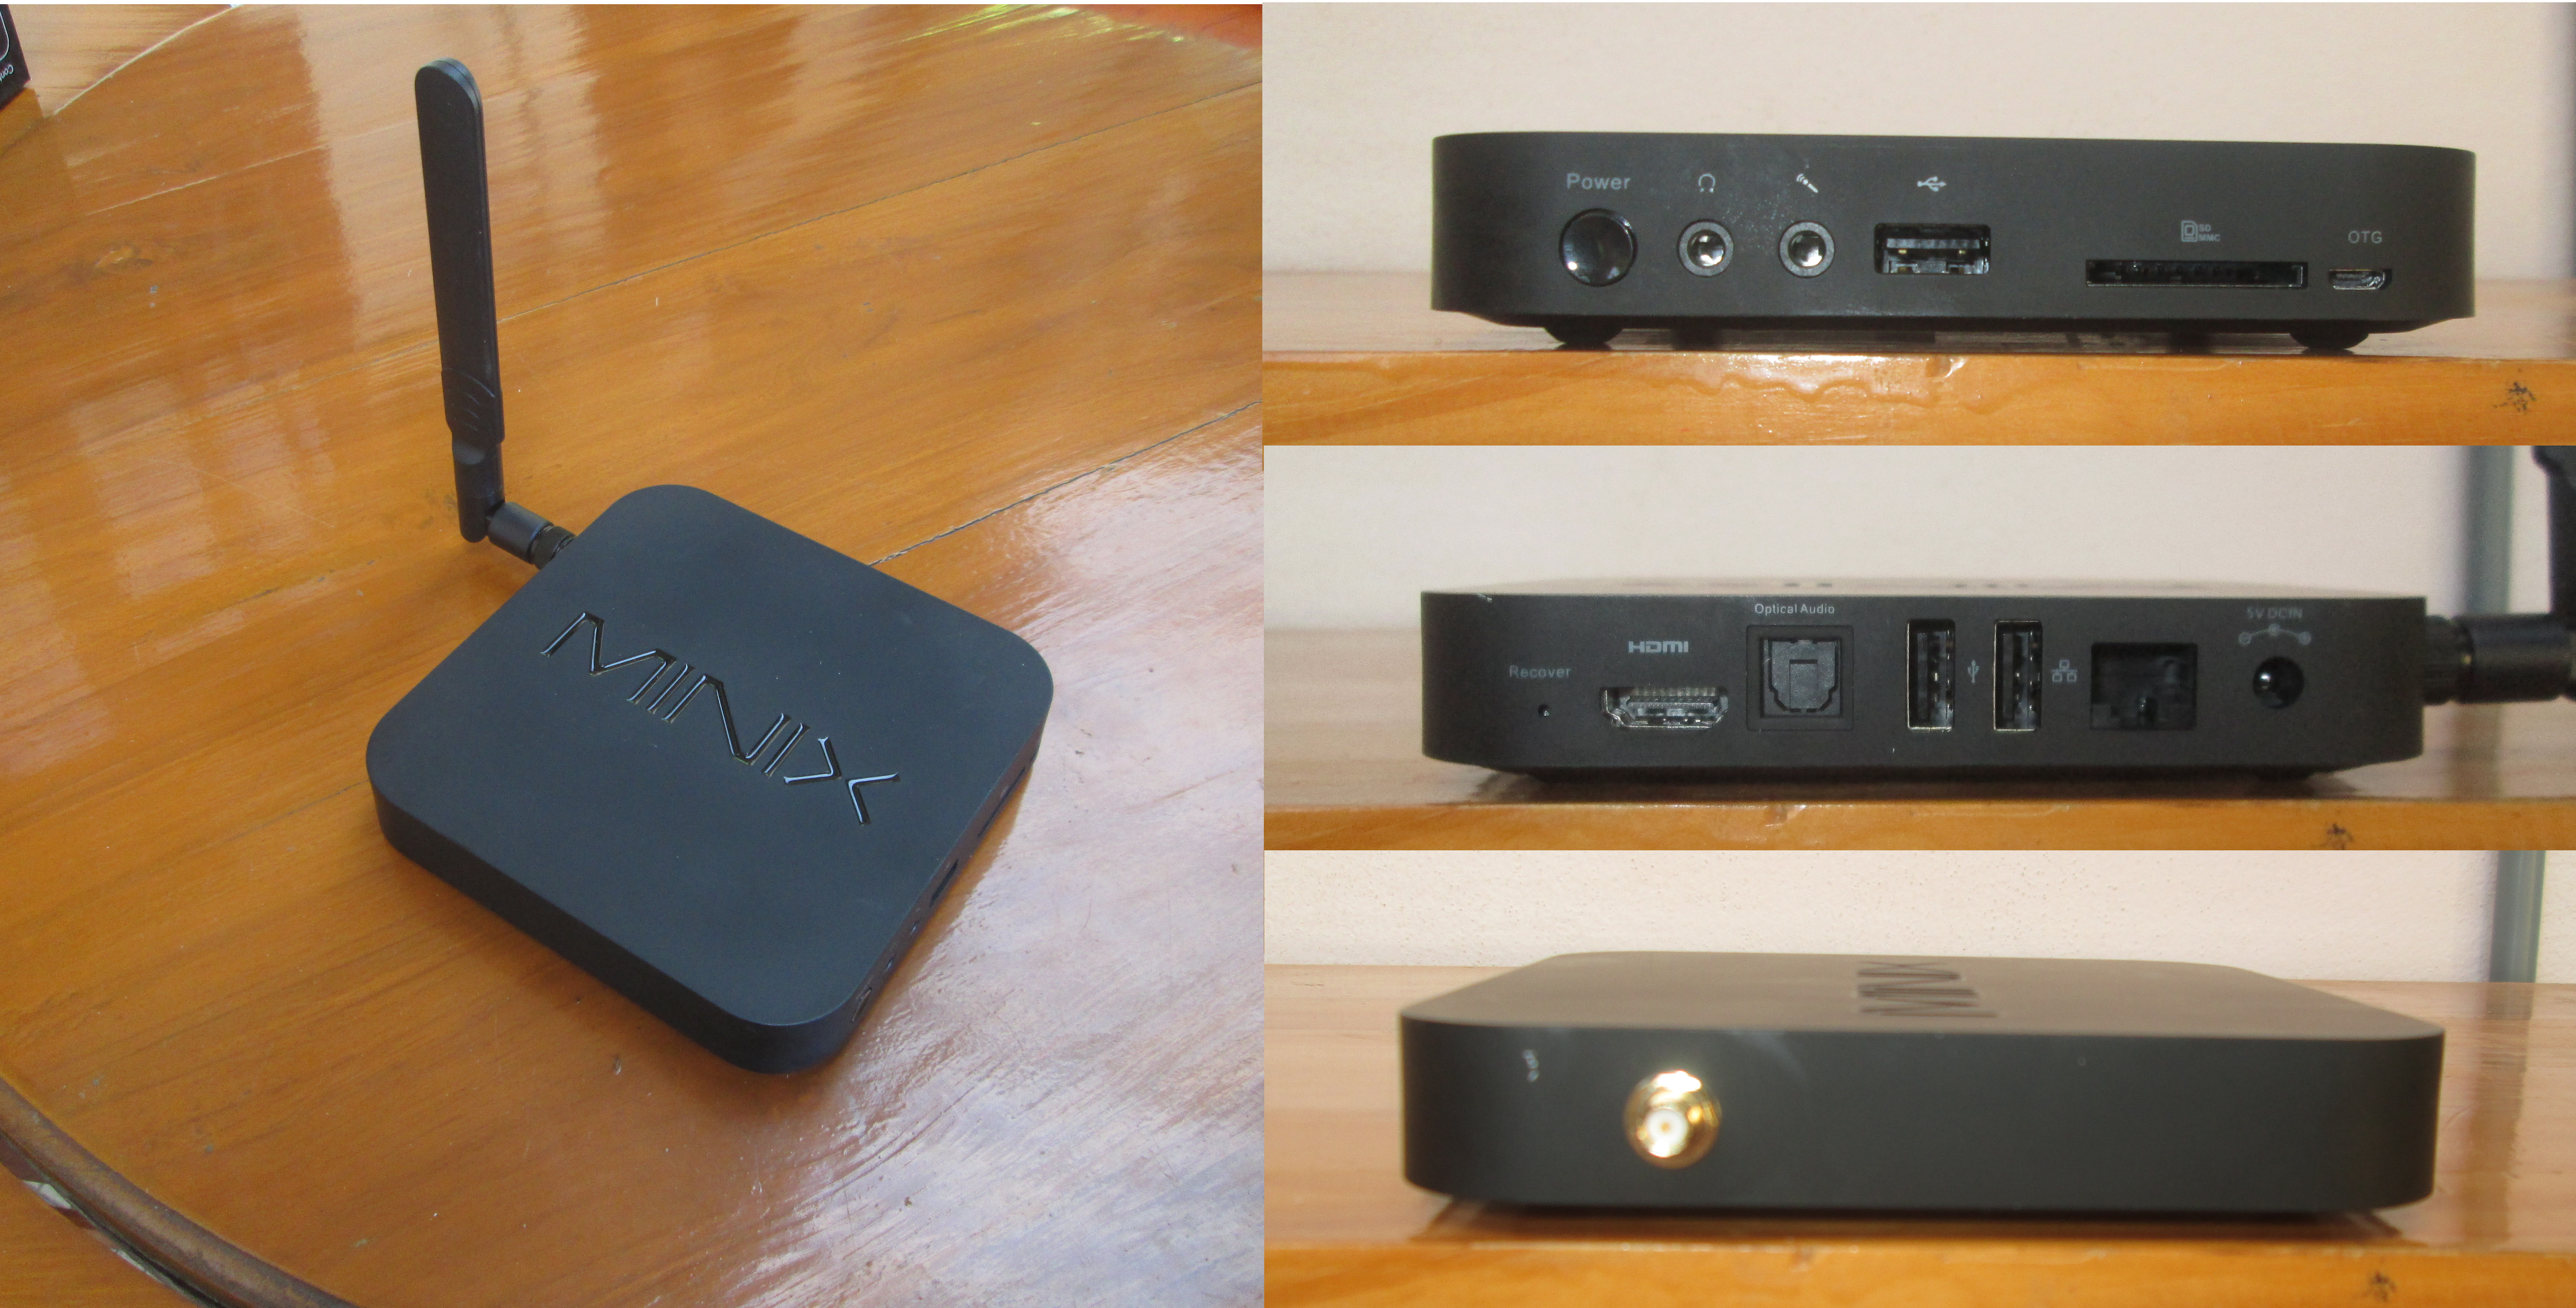 minix neo x8 h plus firmware